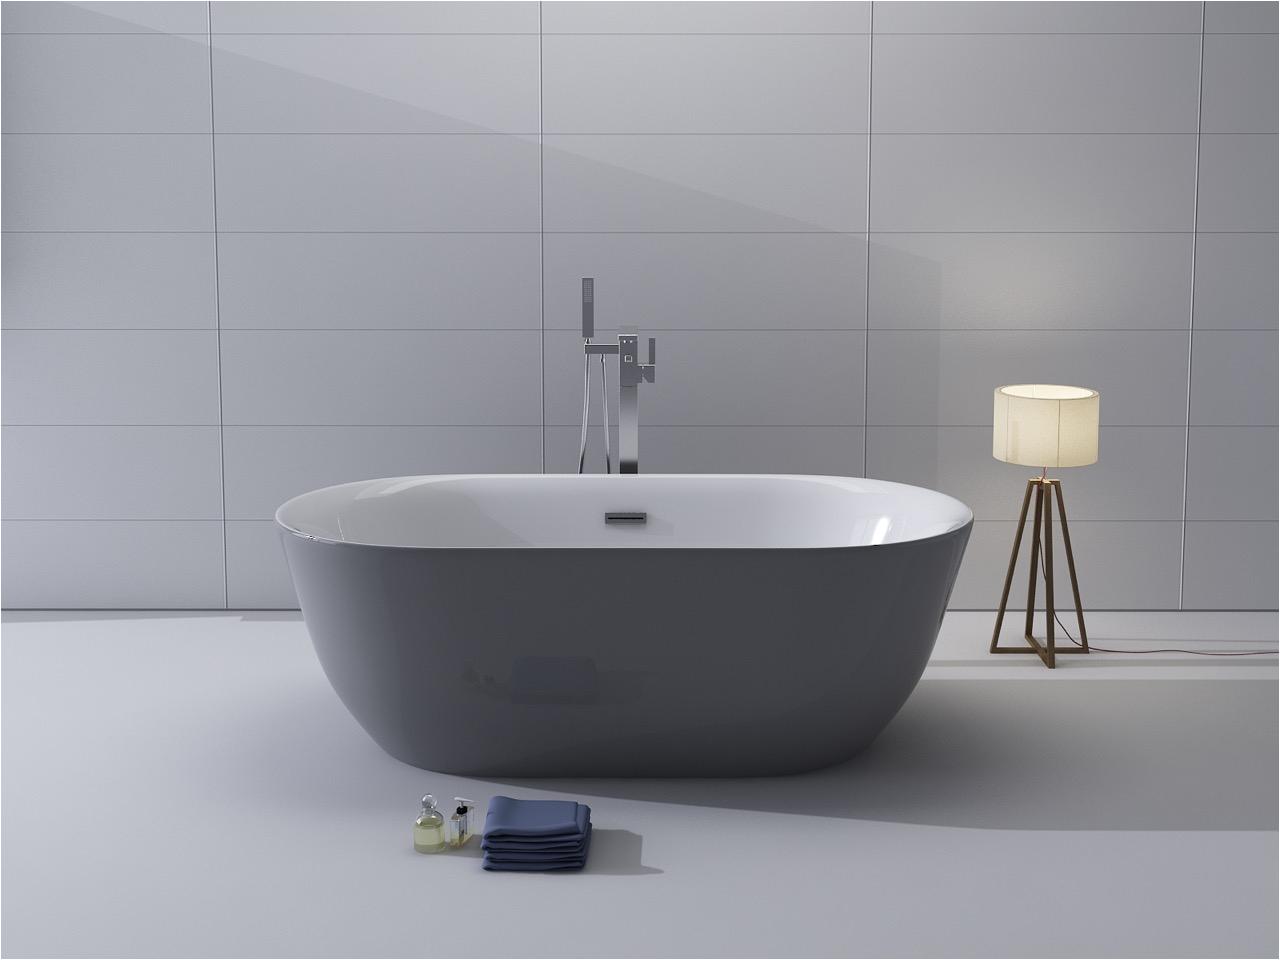 kokss freestanding modern seamless acrylic bathtub lamone gray